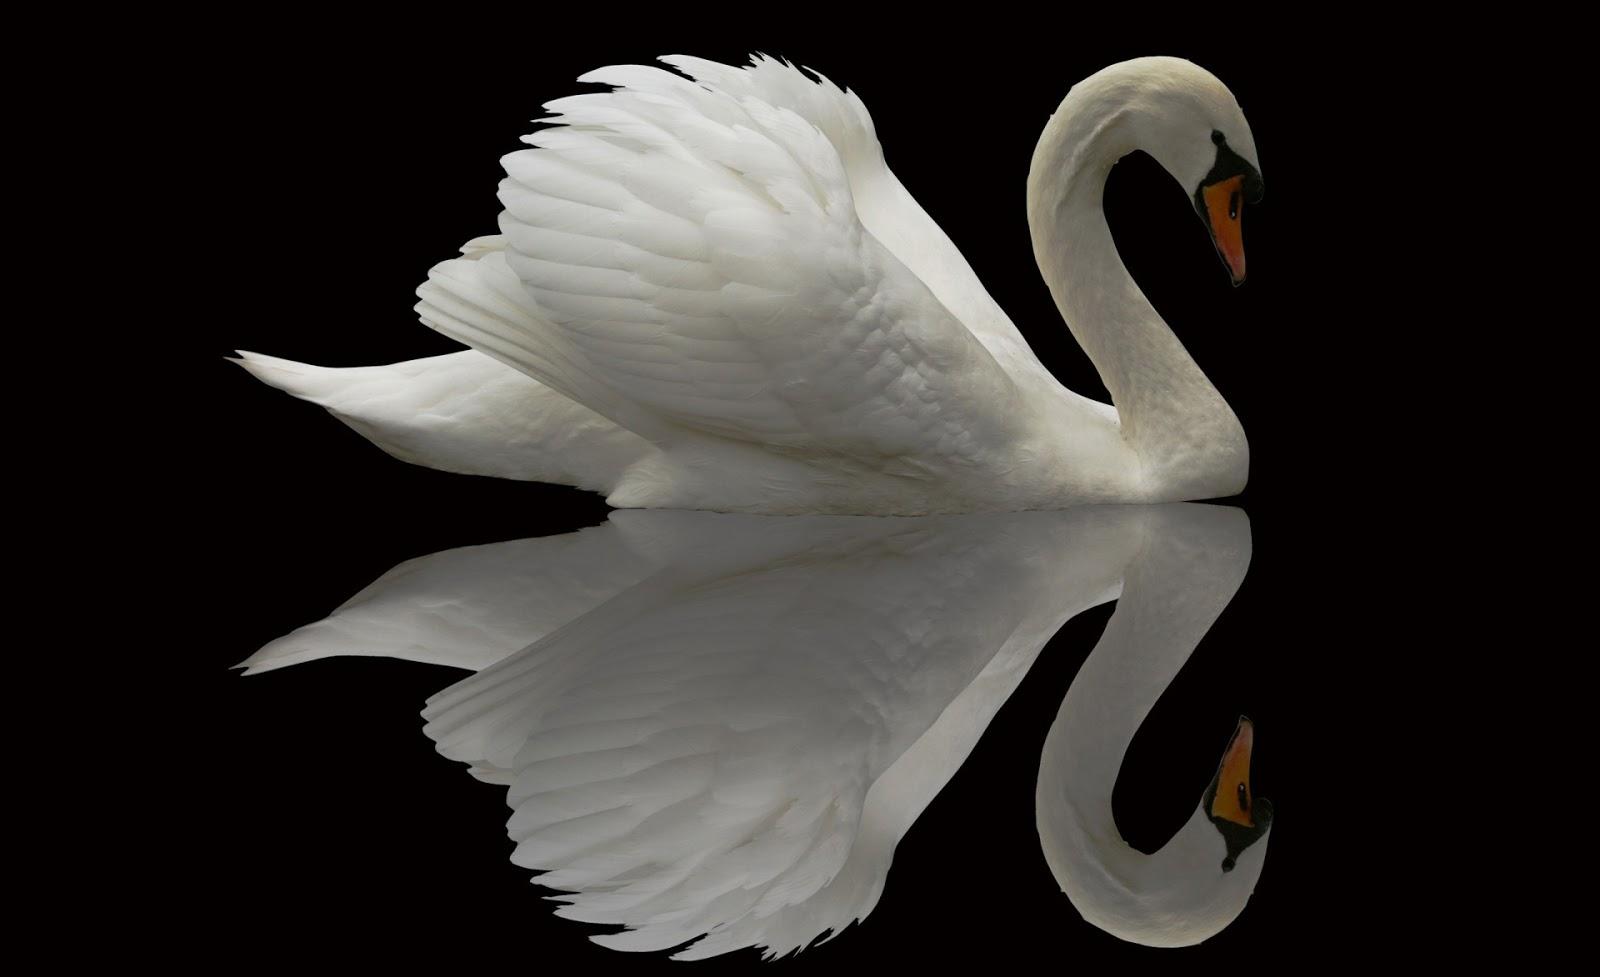 White swan reflectionswanbirds 1600x977